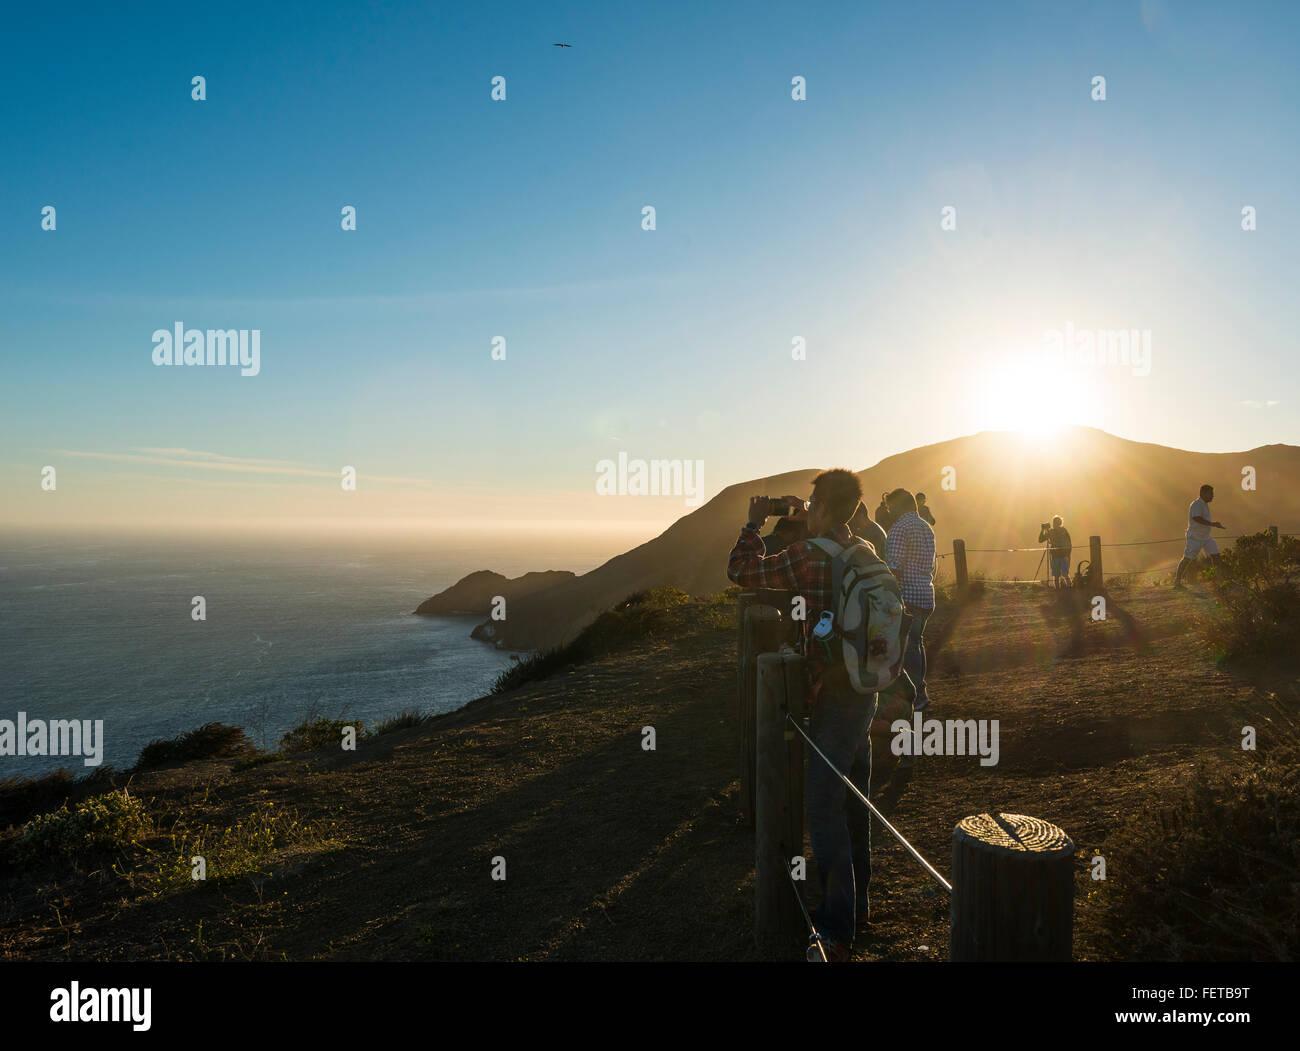 Tourists at a viewpoint, San Francisco, California, USA - Stock Image